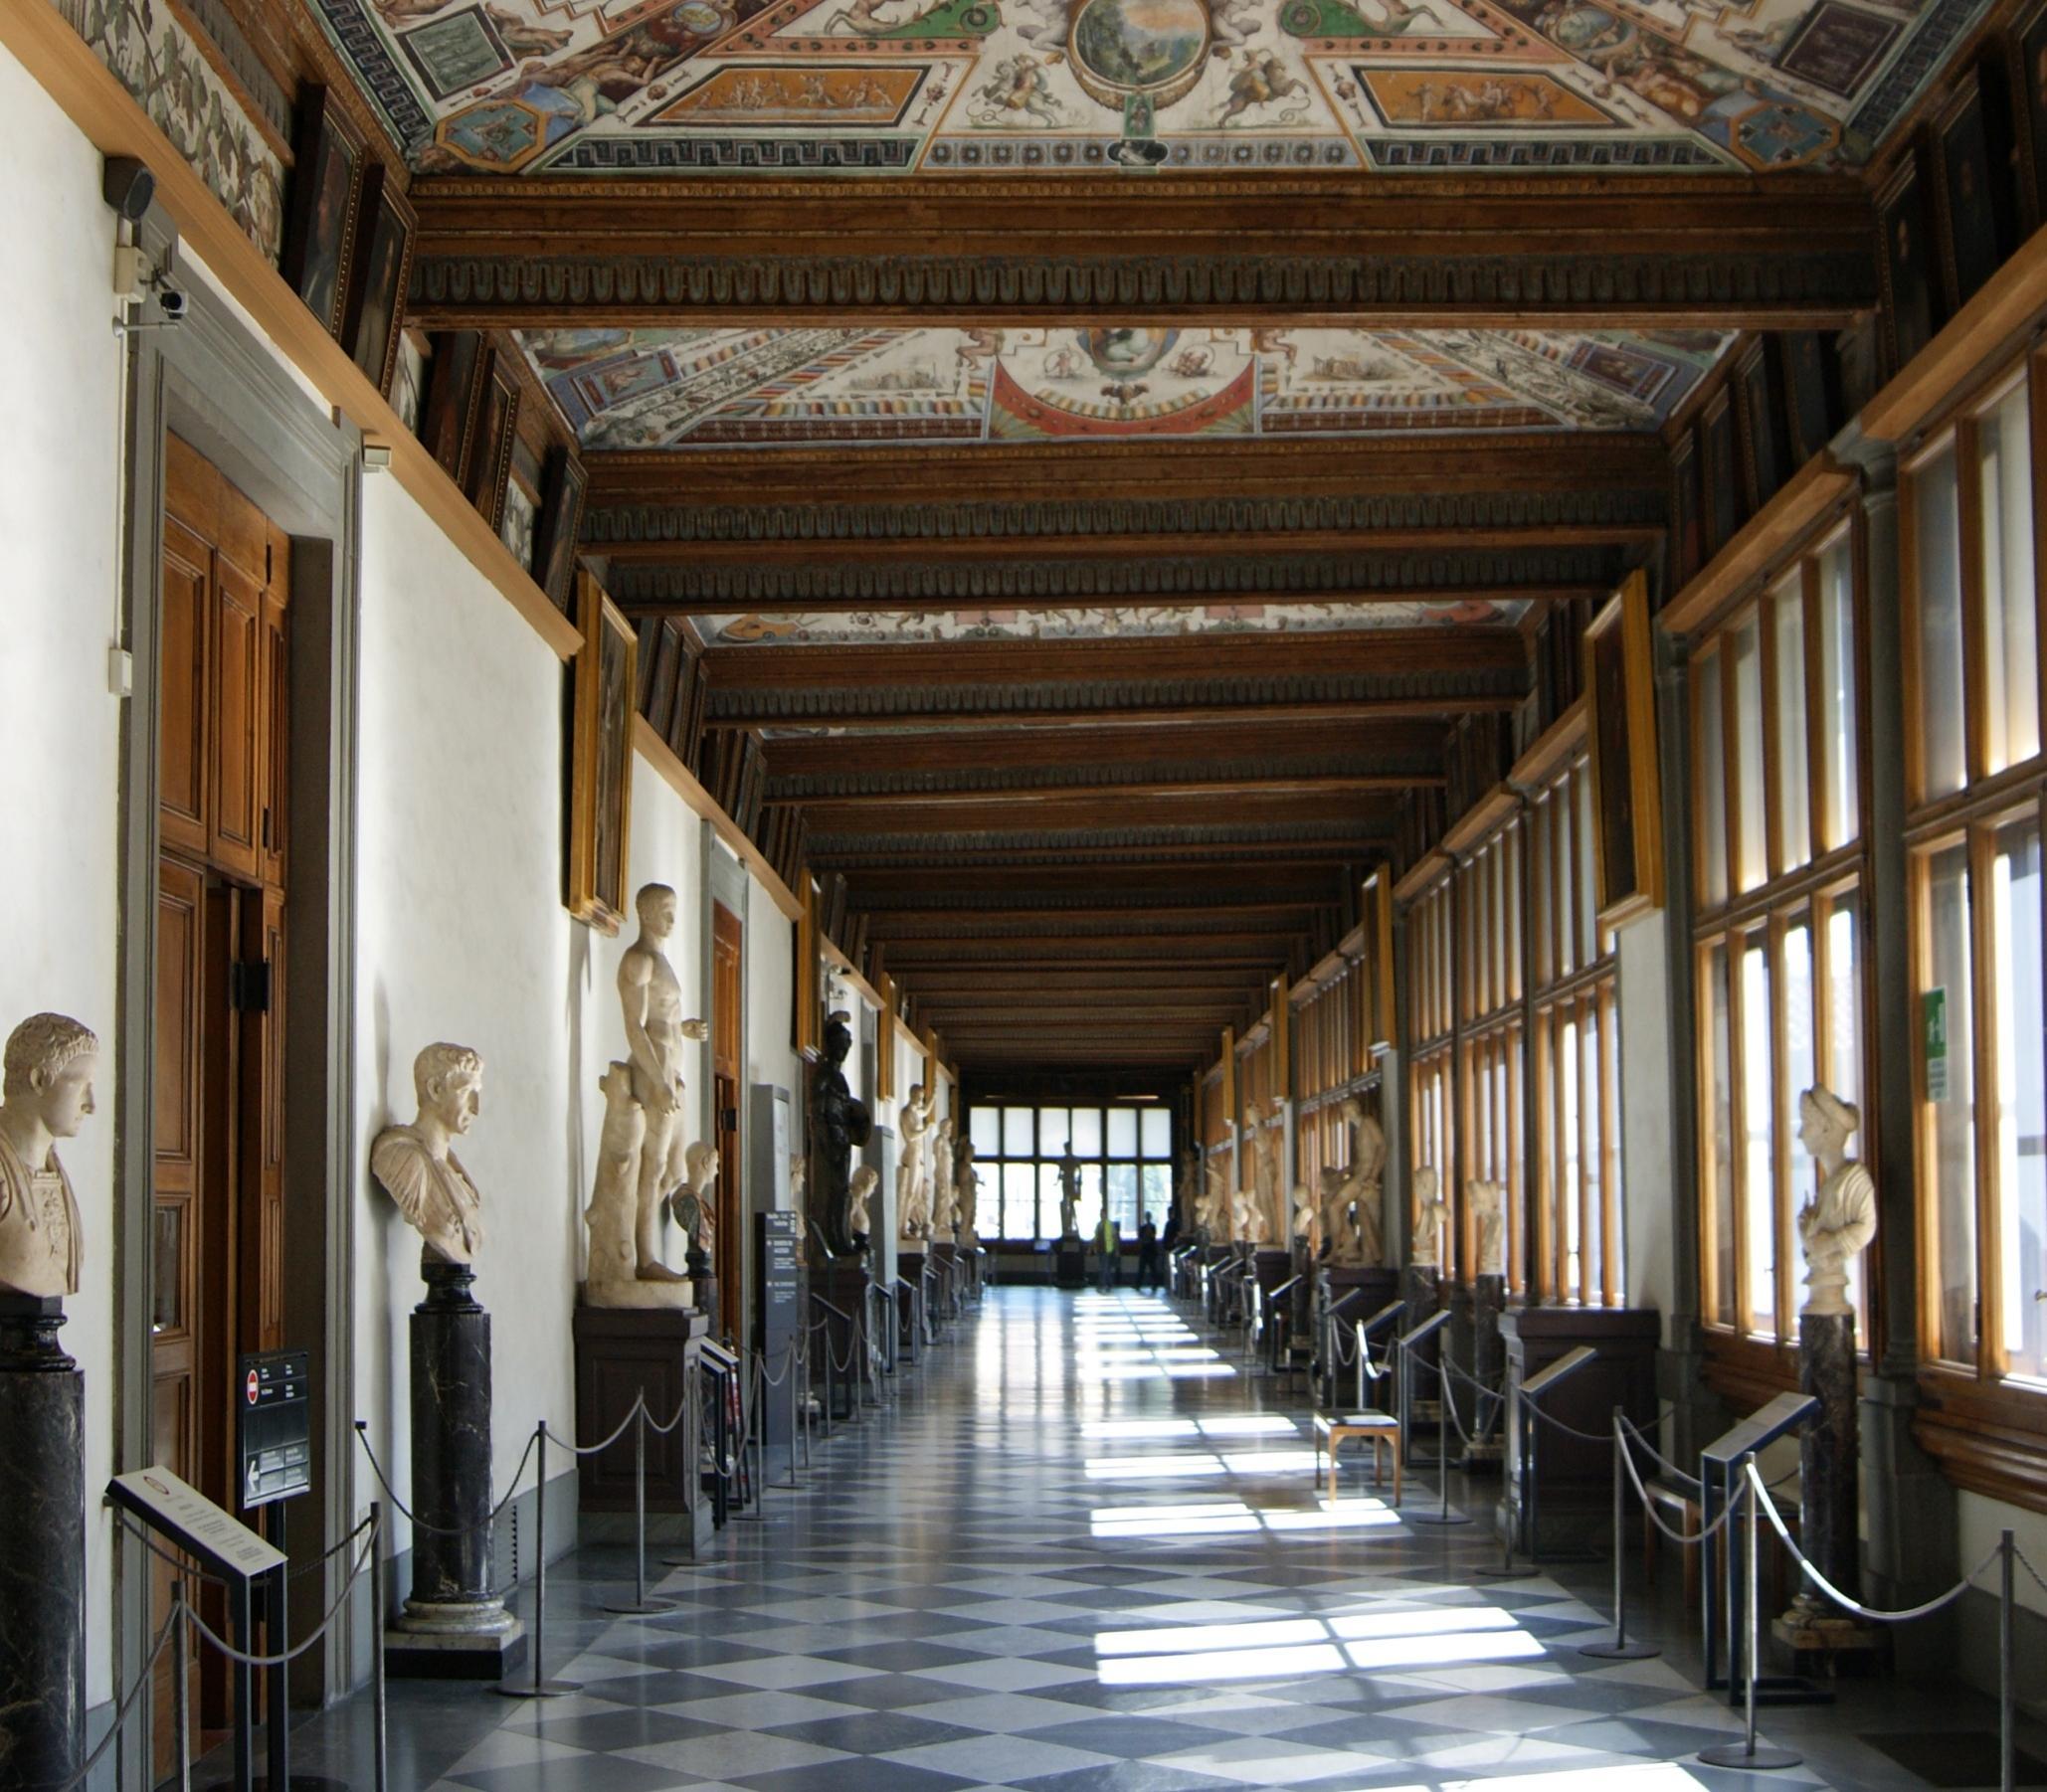 Uffizi aiutano Archeologico Firenze